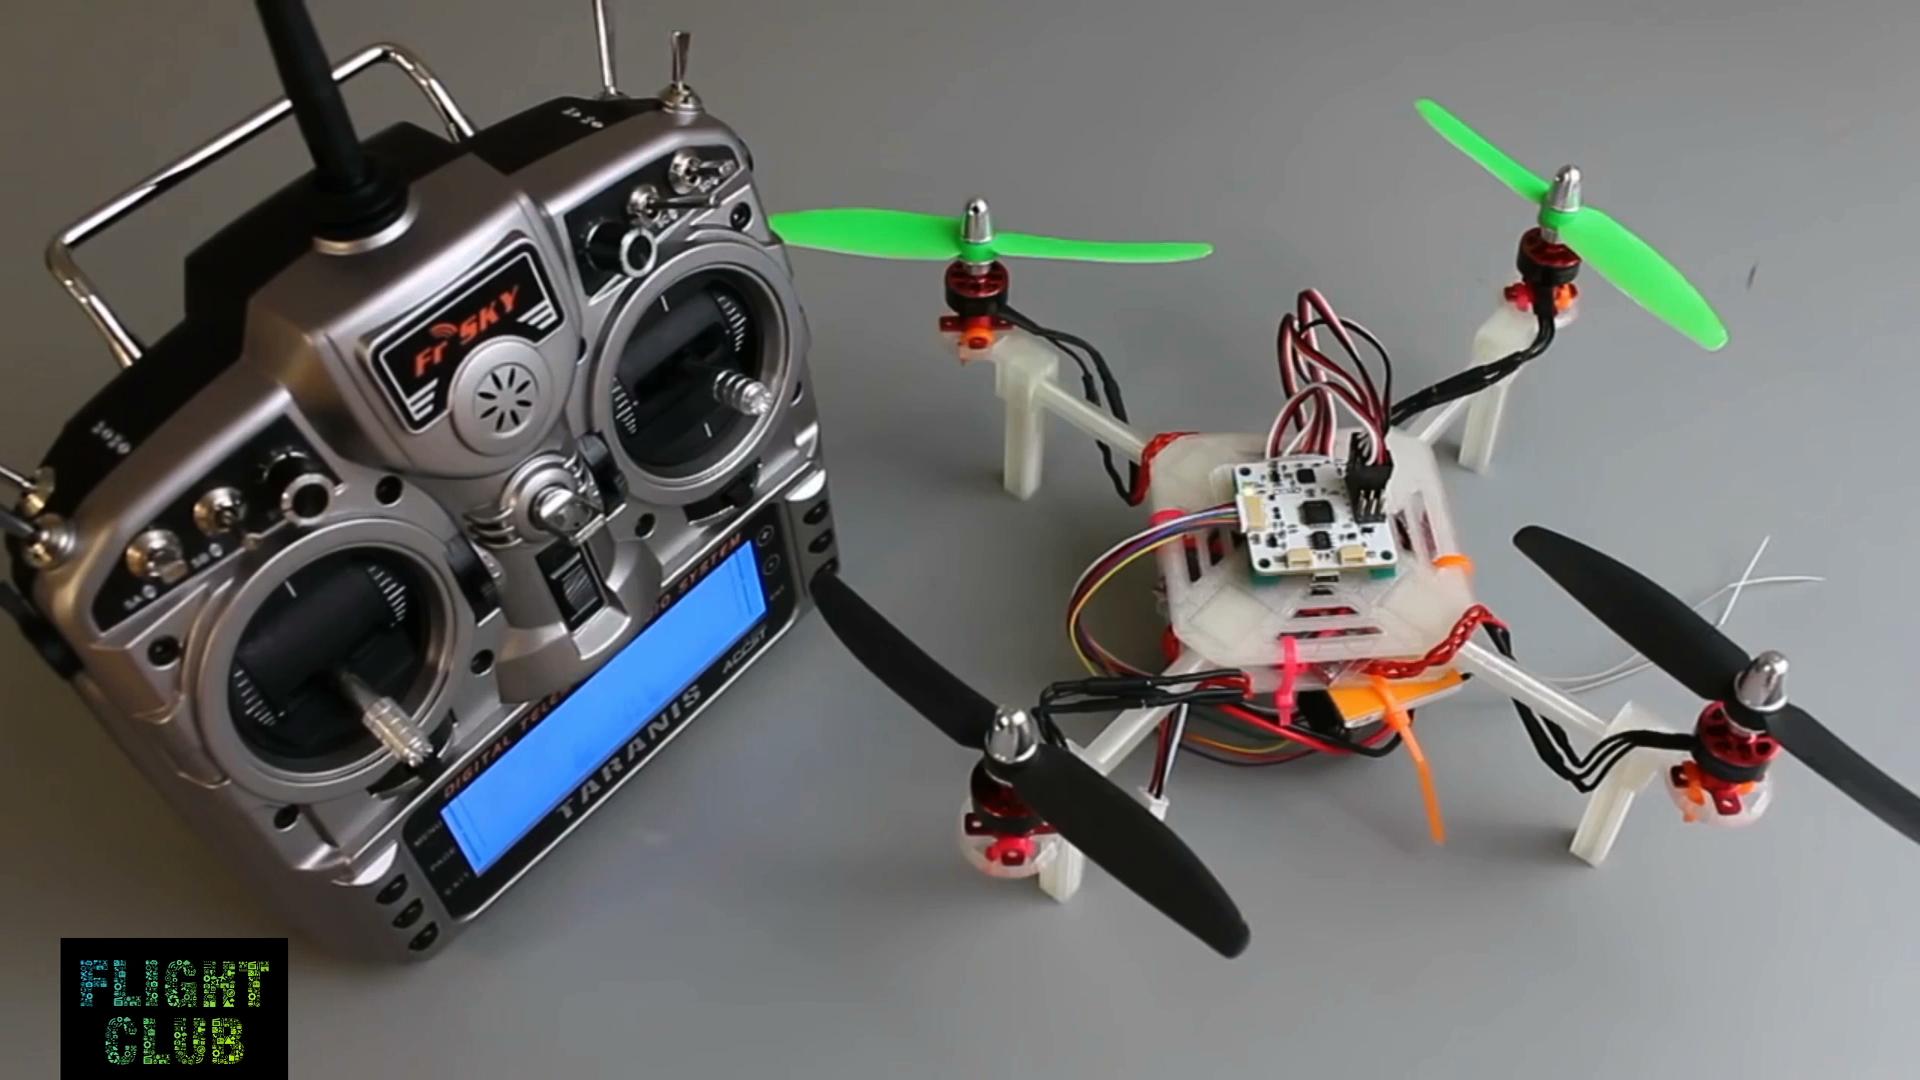 hight resolution of epictv video diy mini quadcopter openpilot cc3d wiringdiy mini quadcopter openpilot cc3d wiring configuration u0026